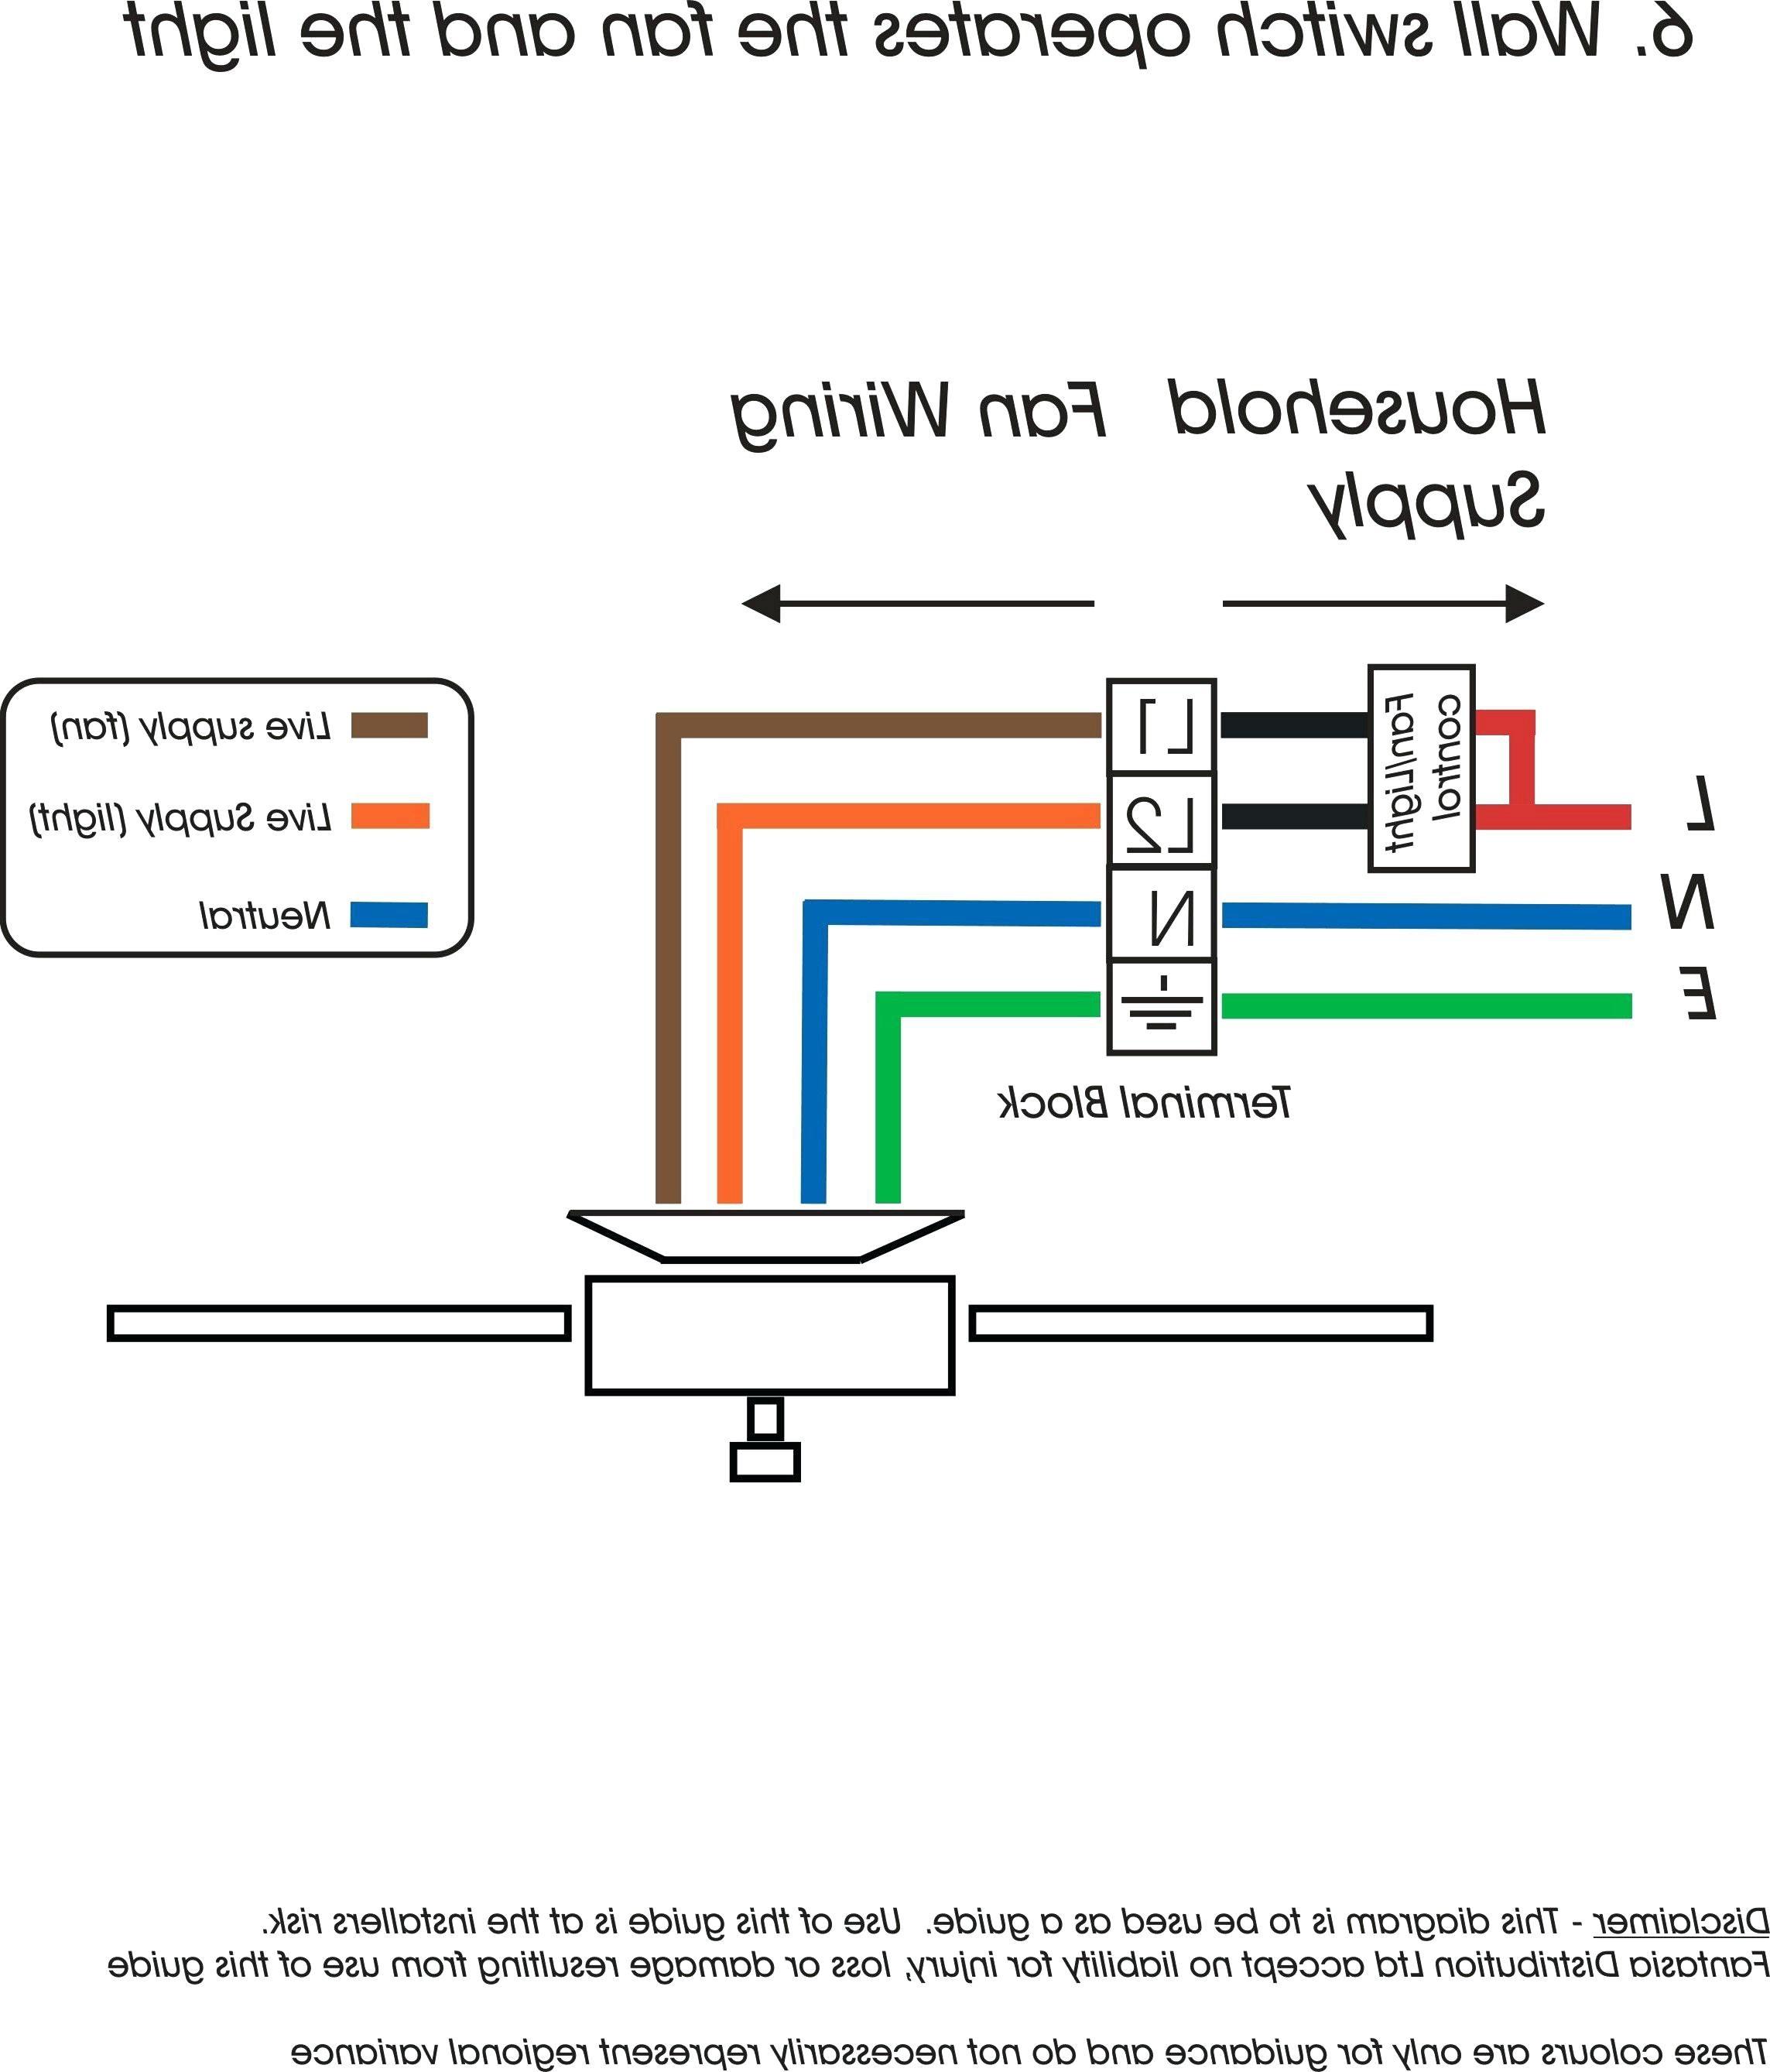 Mishimoto Fan Controller Wiring Diagram | Free Wiring Diagram on